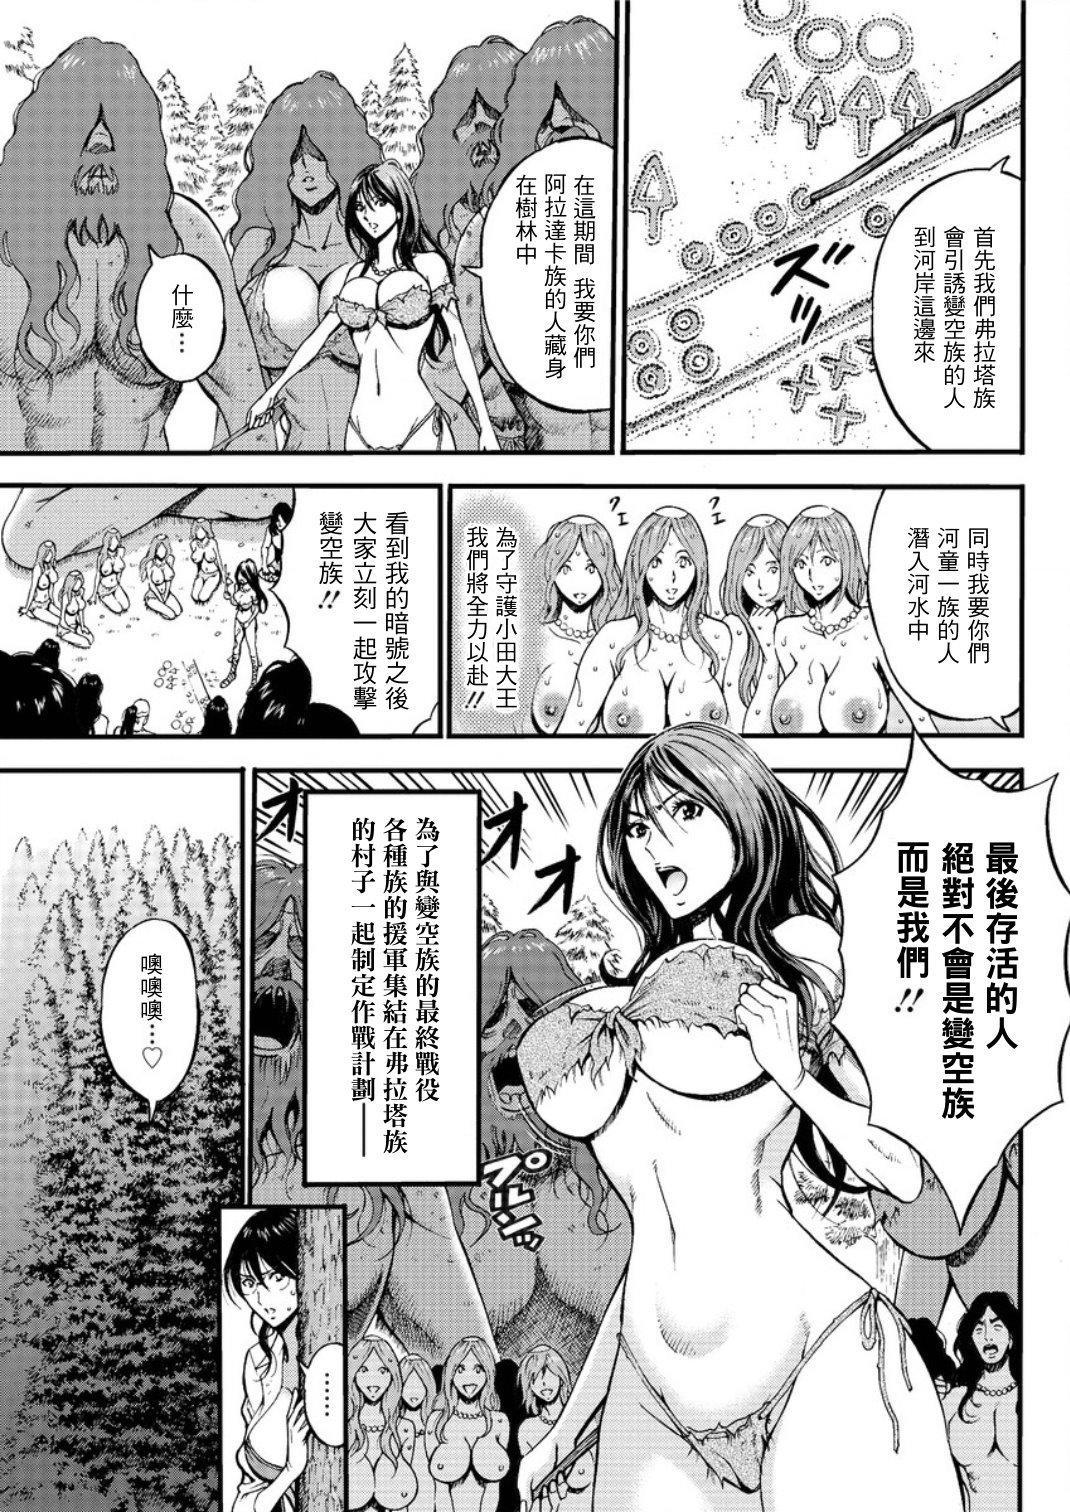 Kigenzen 10000 Nen no Ota | 史前一萬年的宅男 Ch. 19-24 55